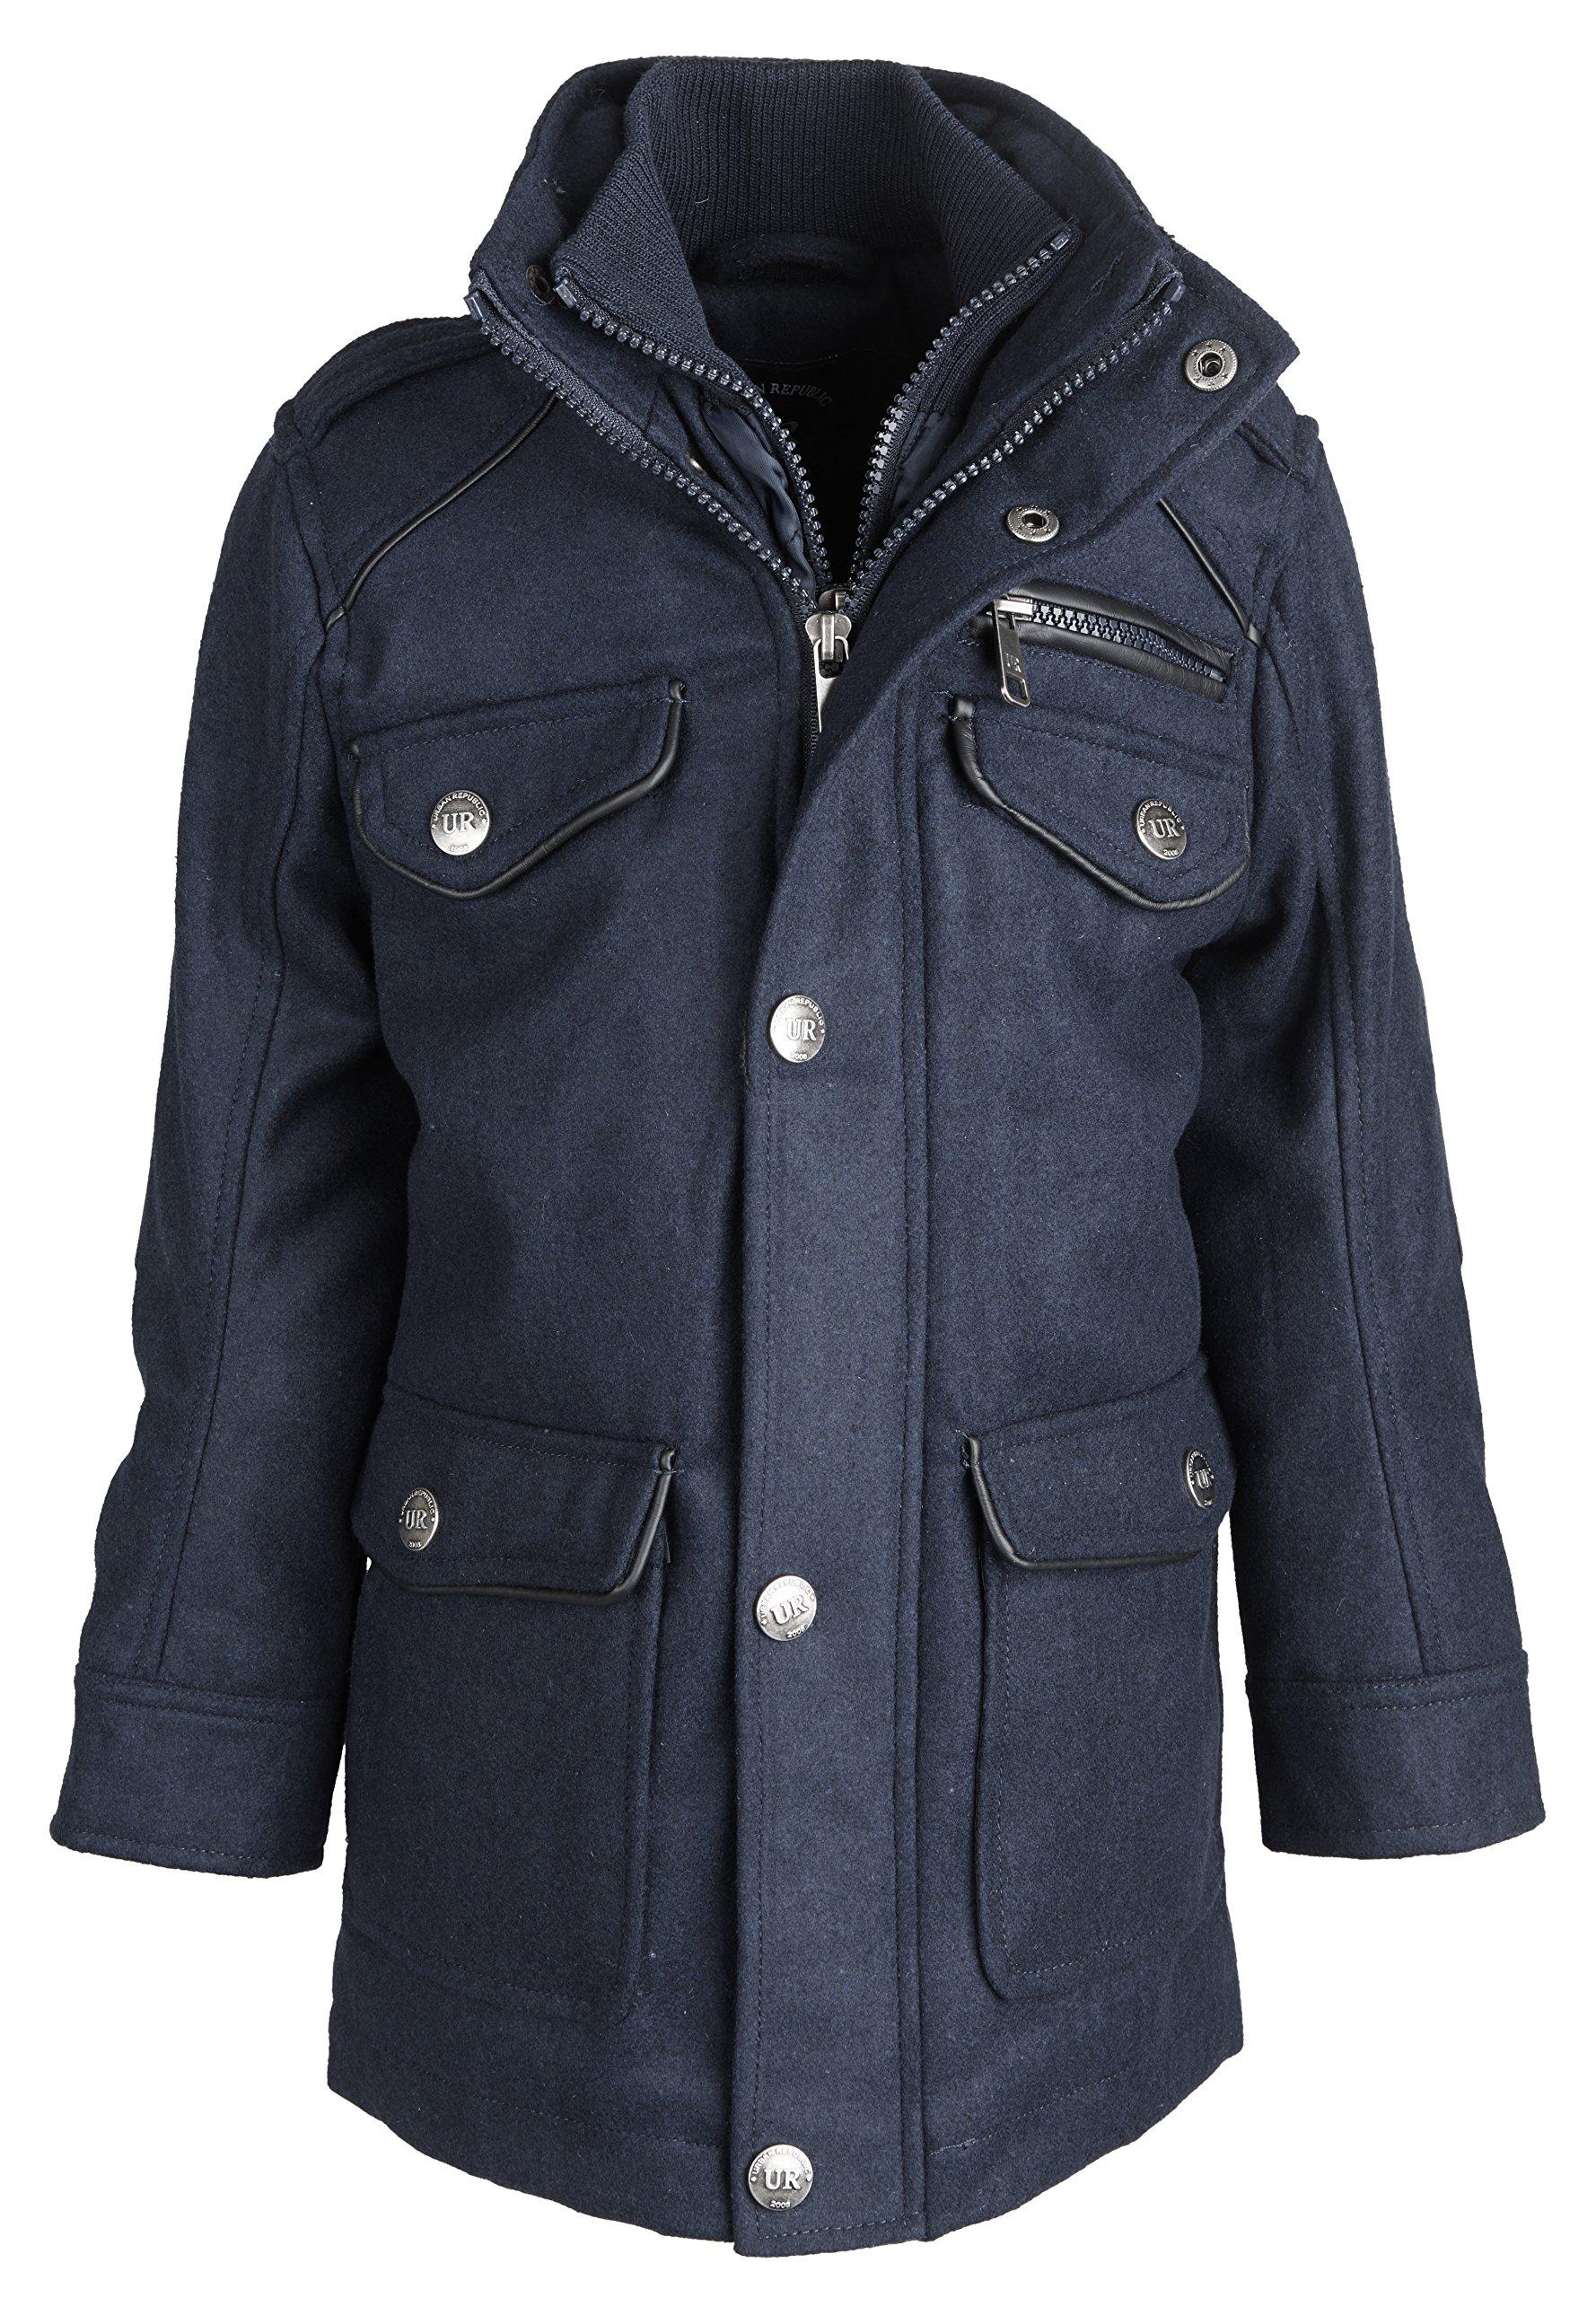 Urban Republic Little Boys Classic Wool Blend Padded Winter Jacket Vestee - Navy (Size 4)